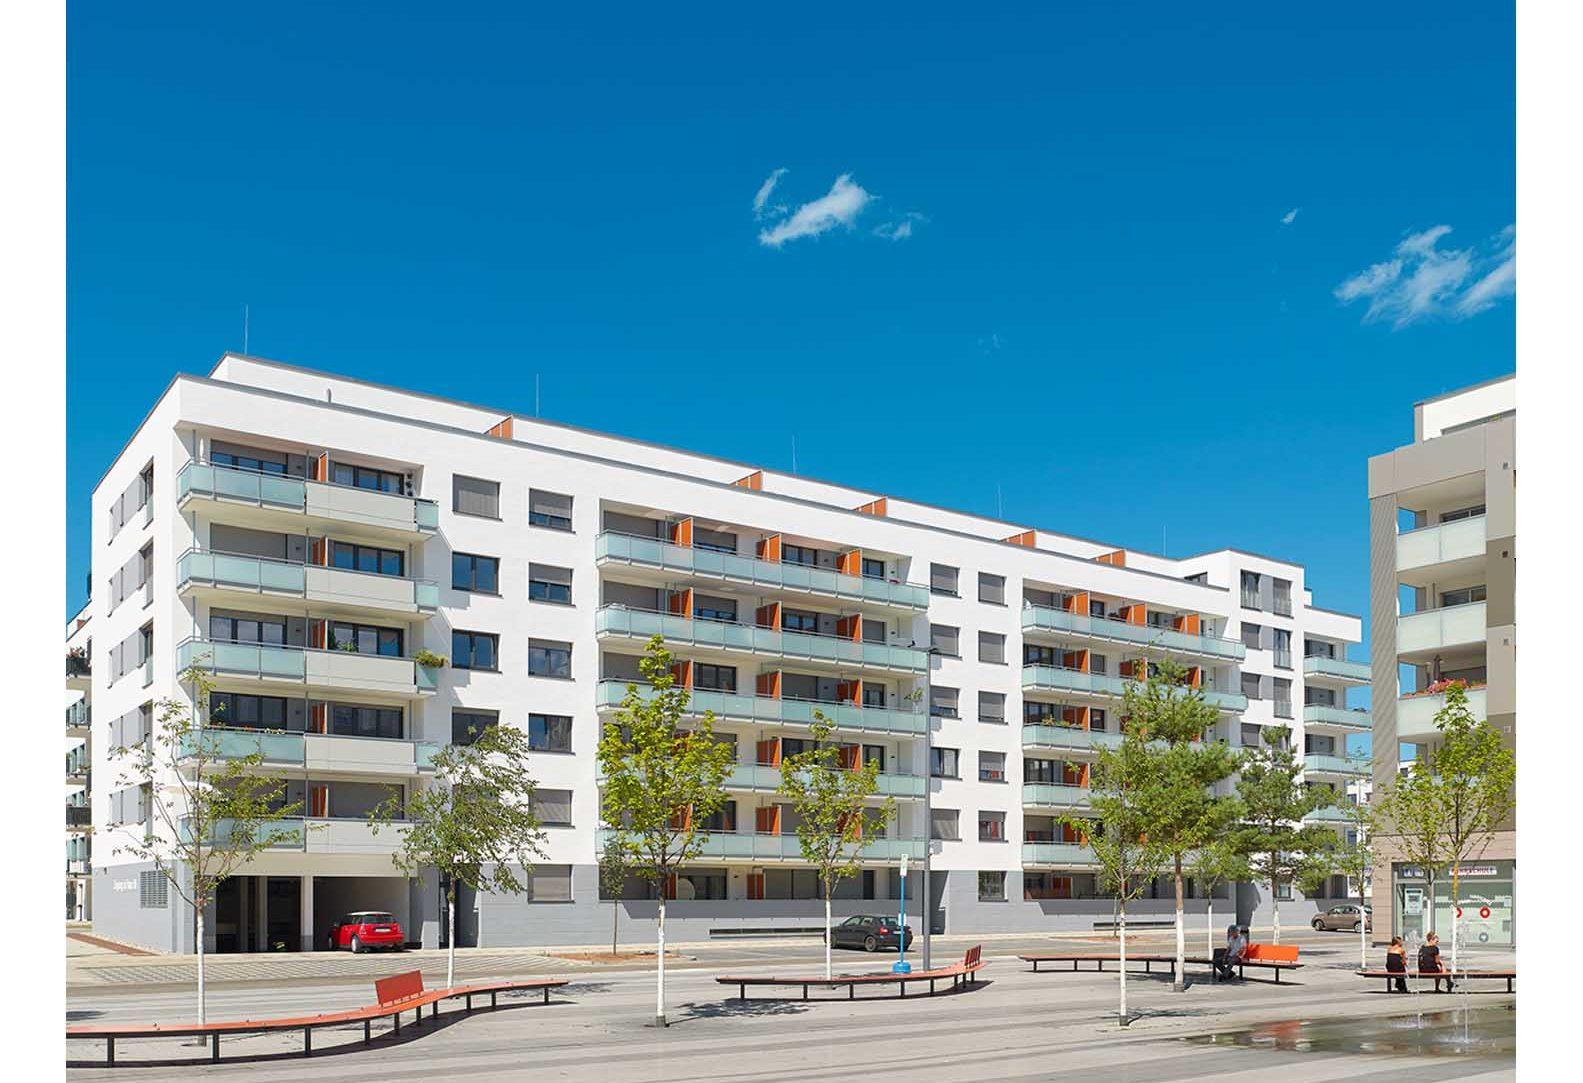 Wohnbebauung Flugfeld - Böblingen